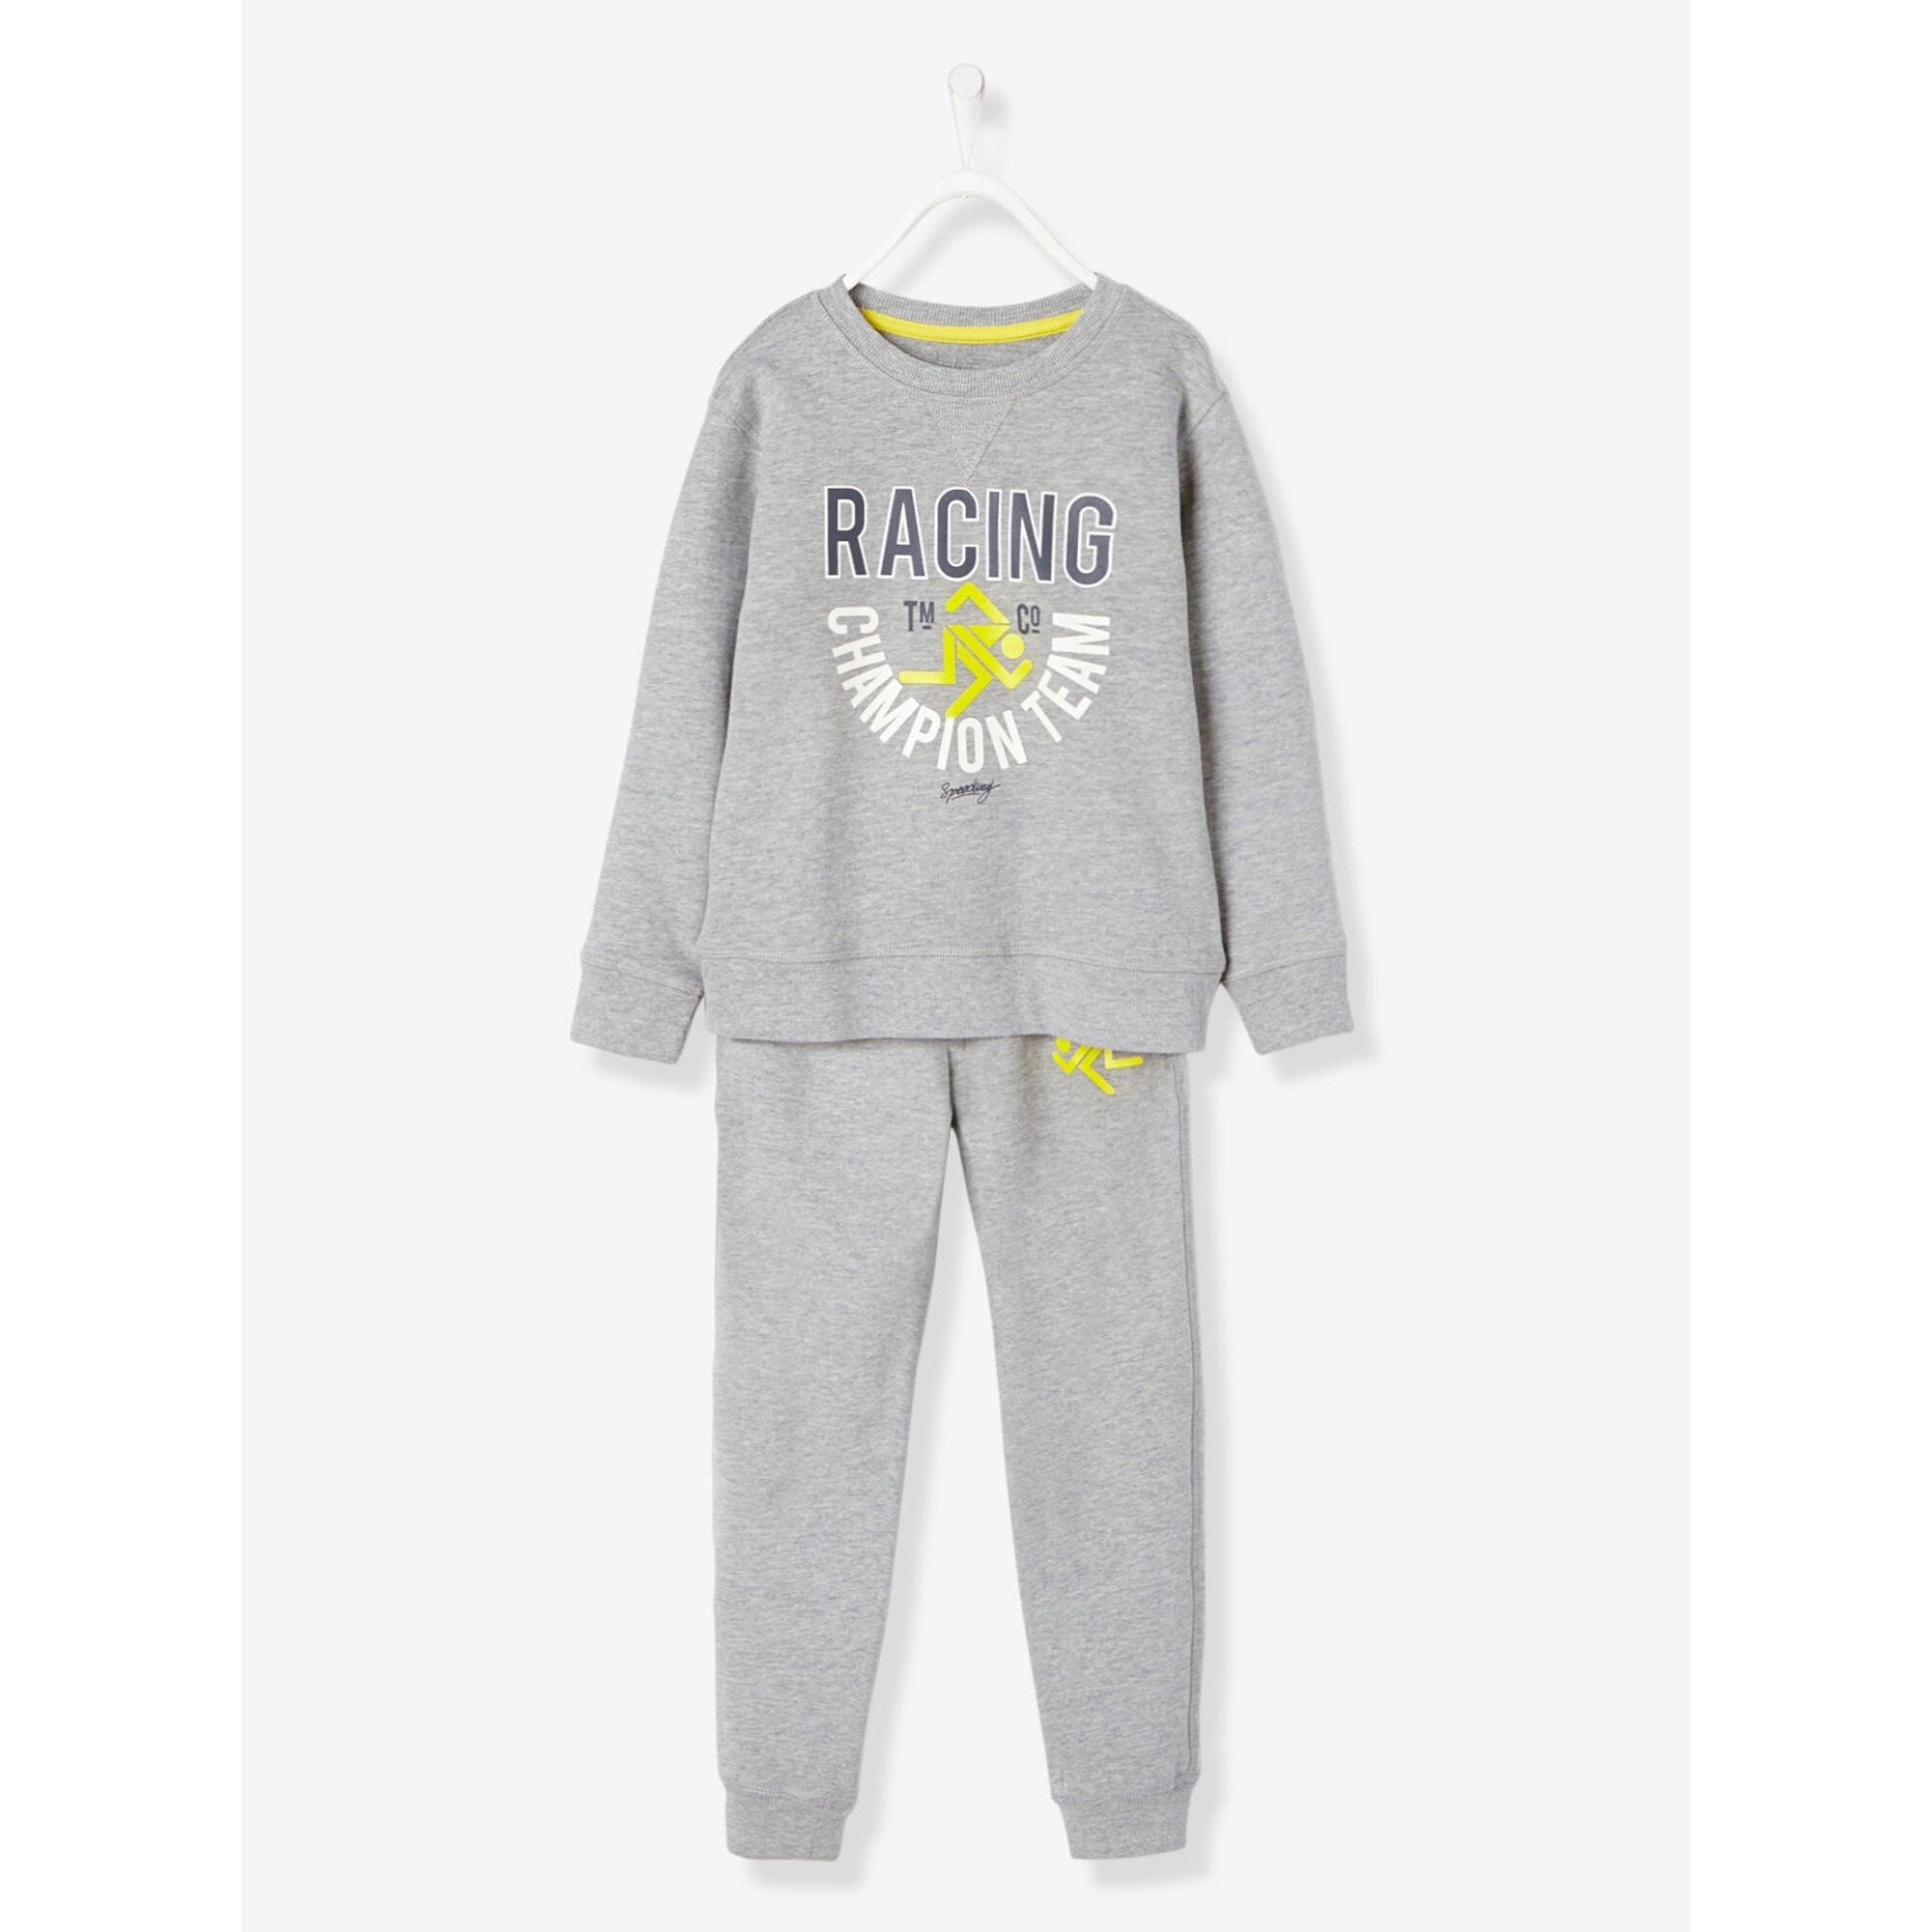 vertbaudet-jungen-sport-set-aus-sweater-und-jogginghose, 30.99 EUR @ babywalz-de